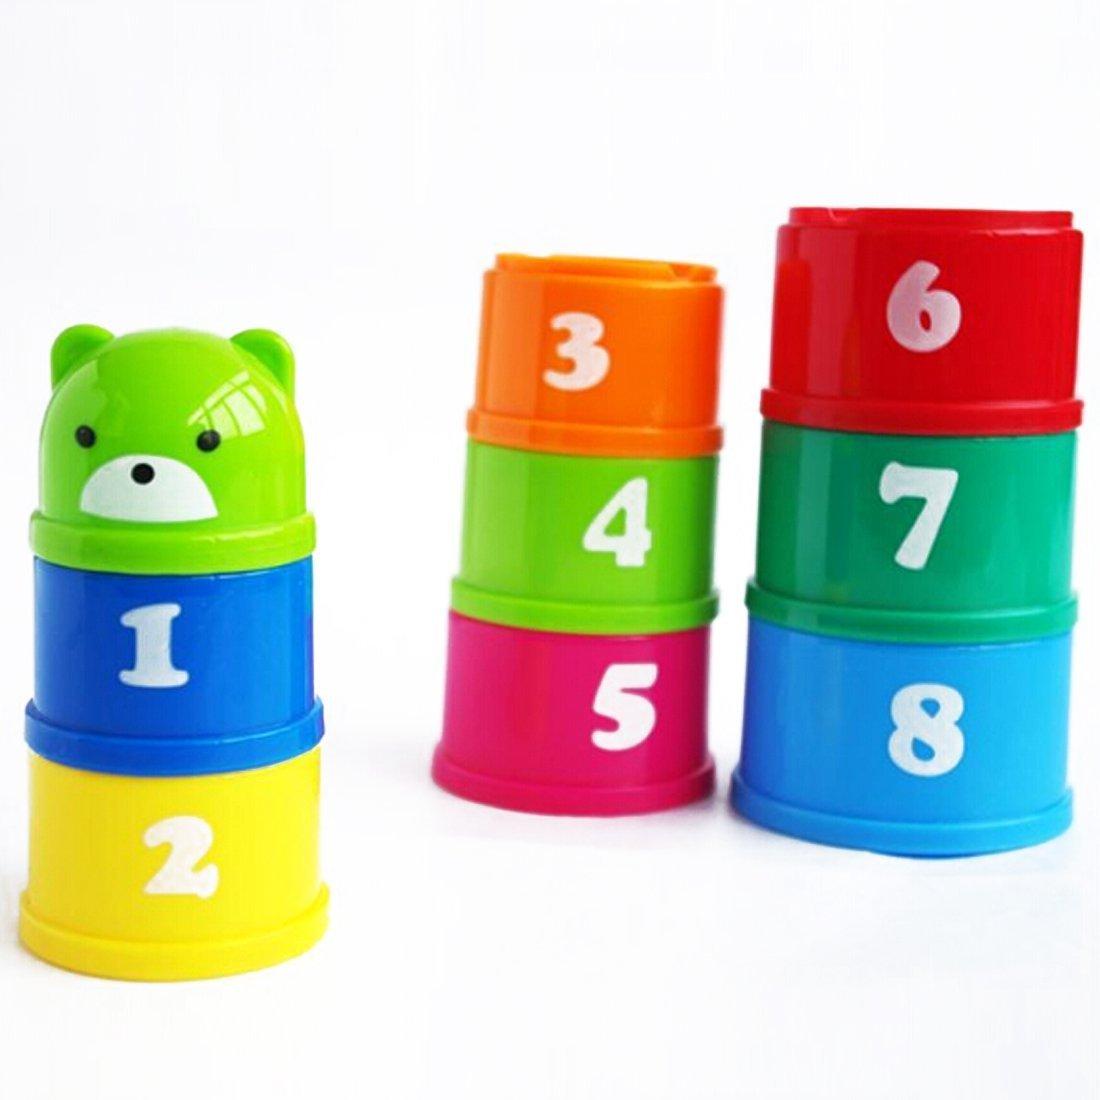 HuSuper Cute Bear Toy Stack Cup B077973QZ4 | Verschiedene Stile